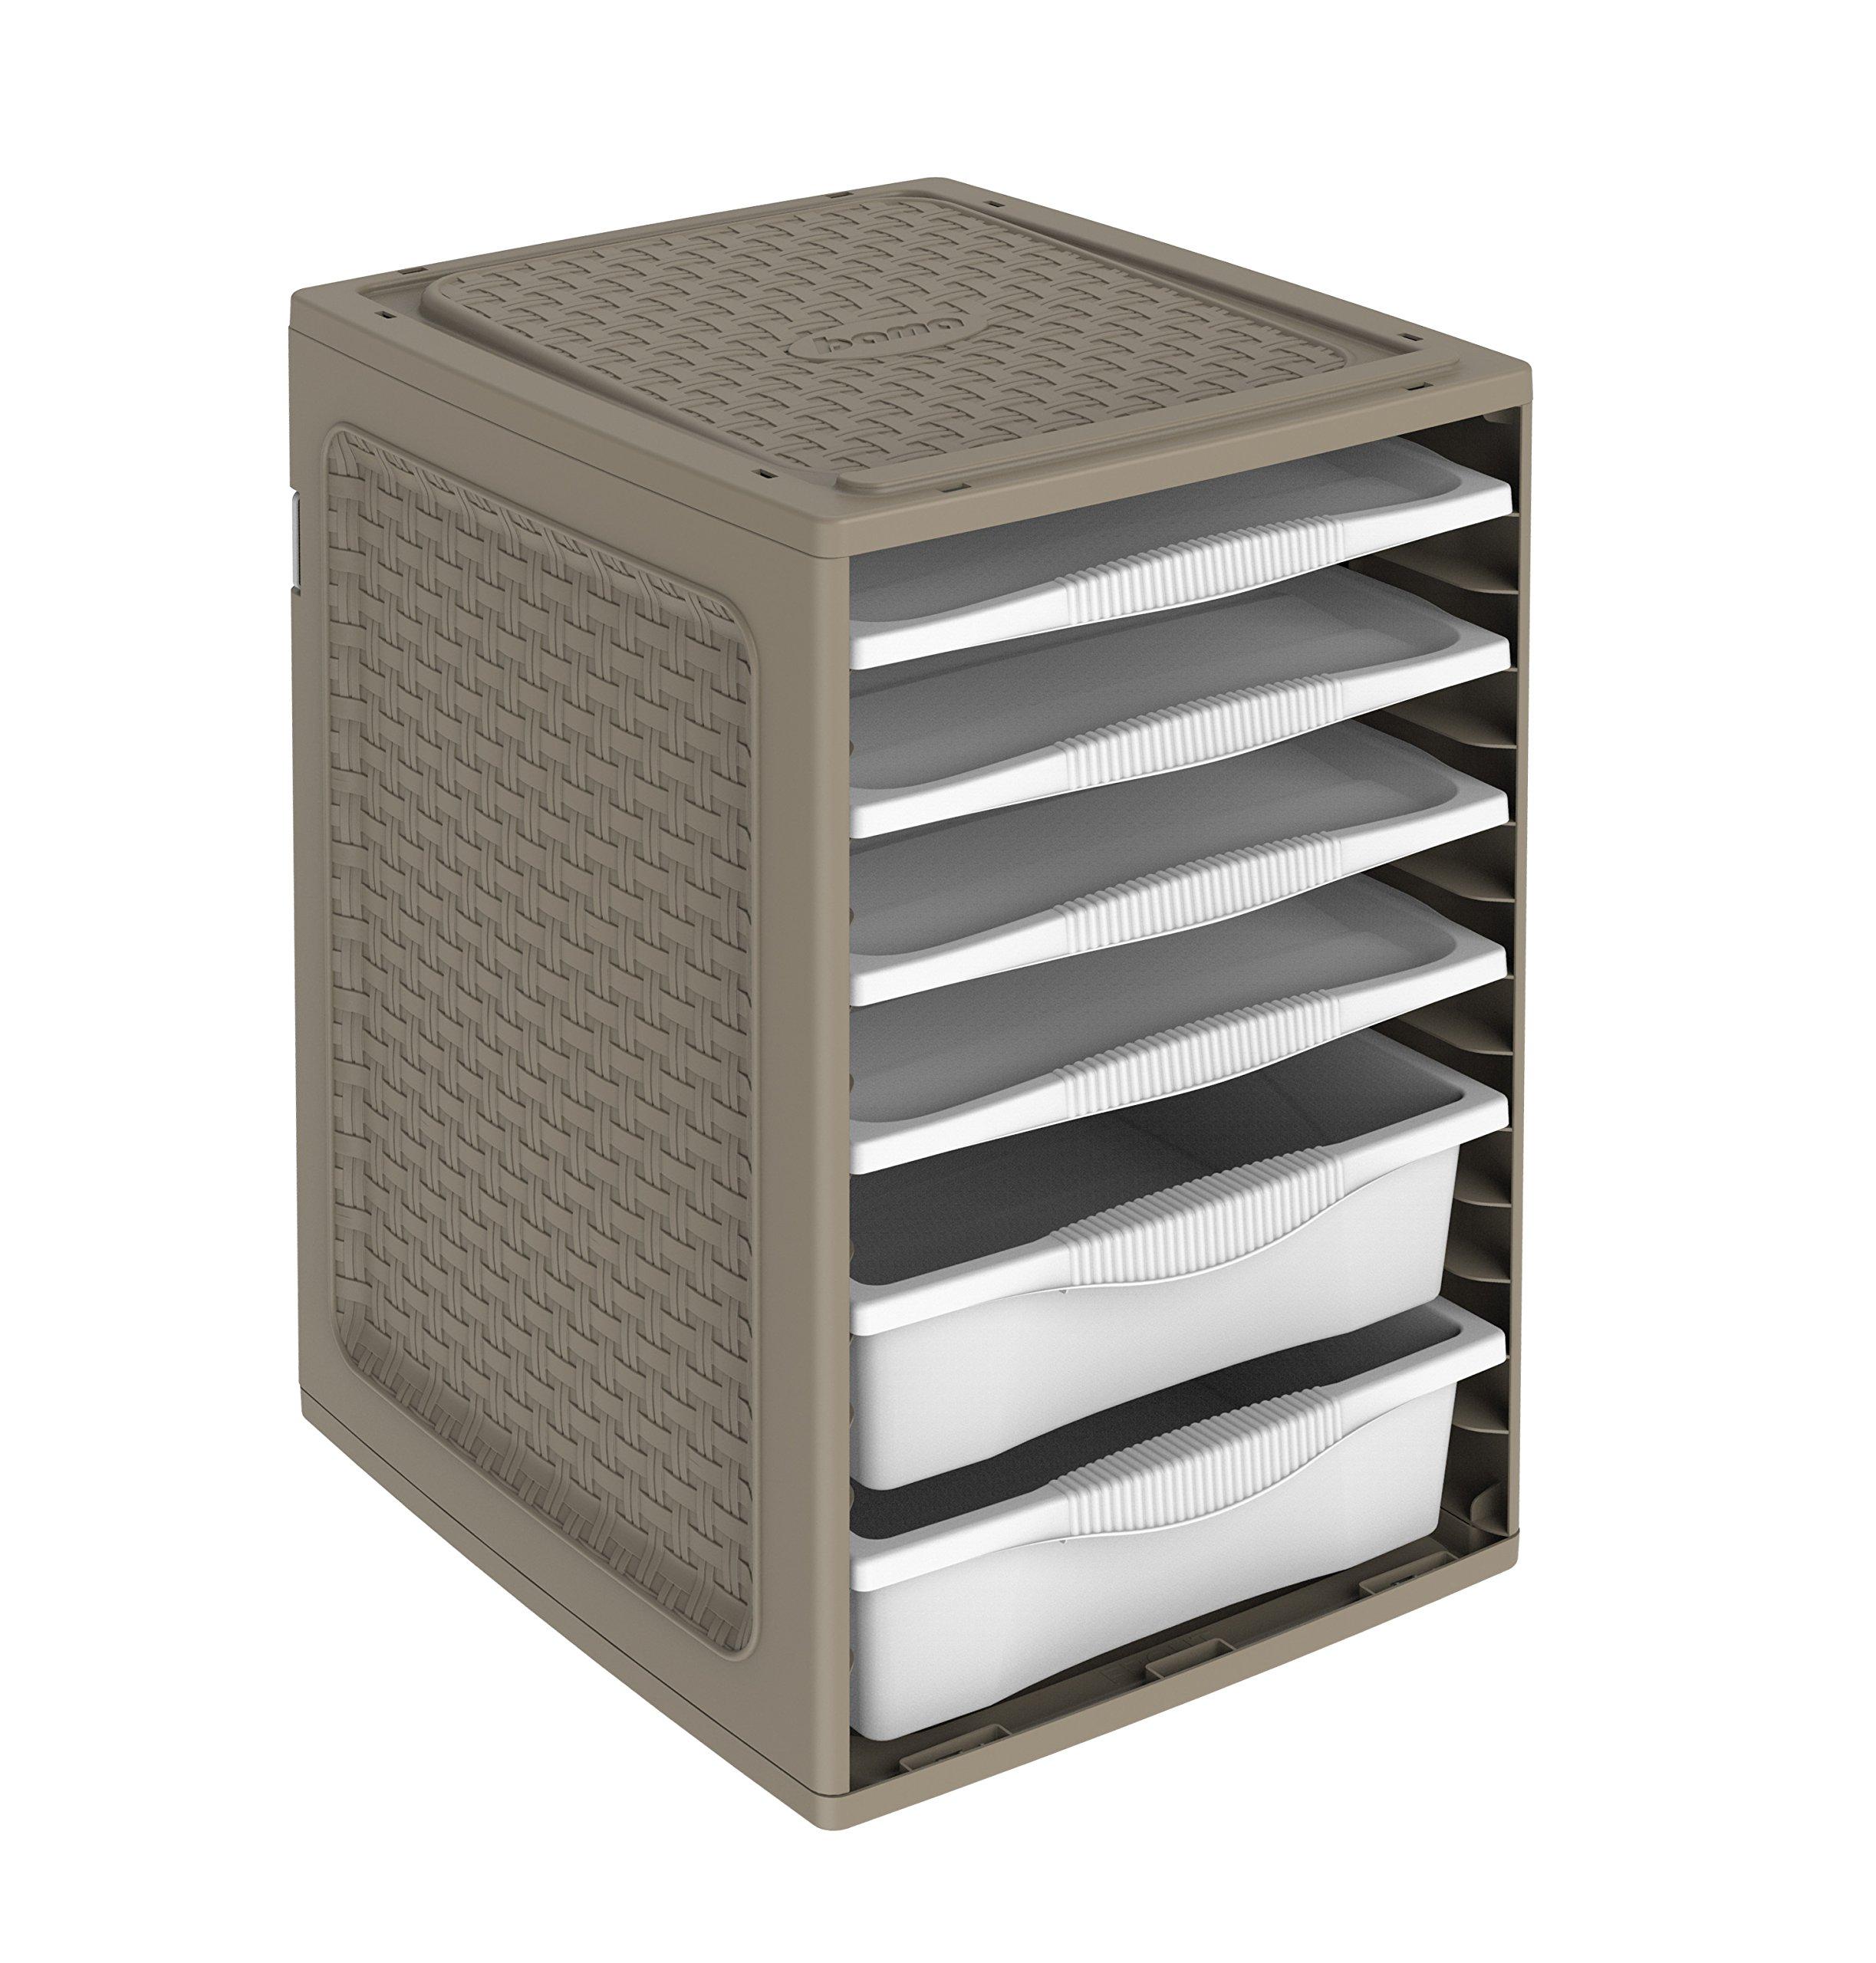 Bama Ri.Ordino Clothes Compartment-Taupe, One Size